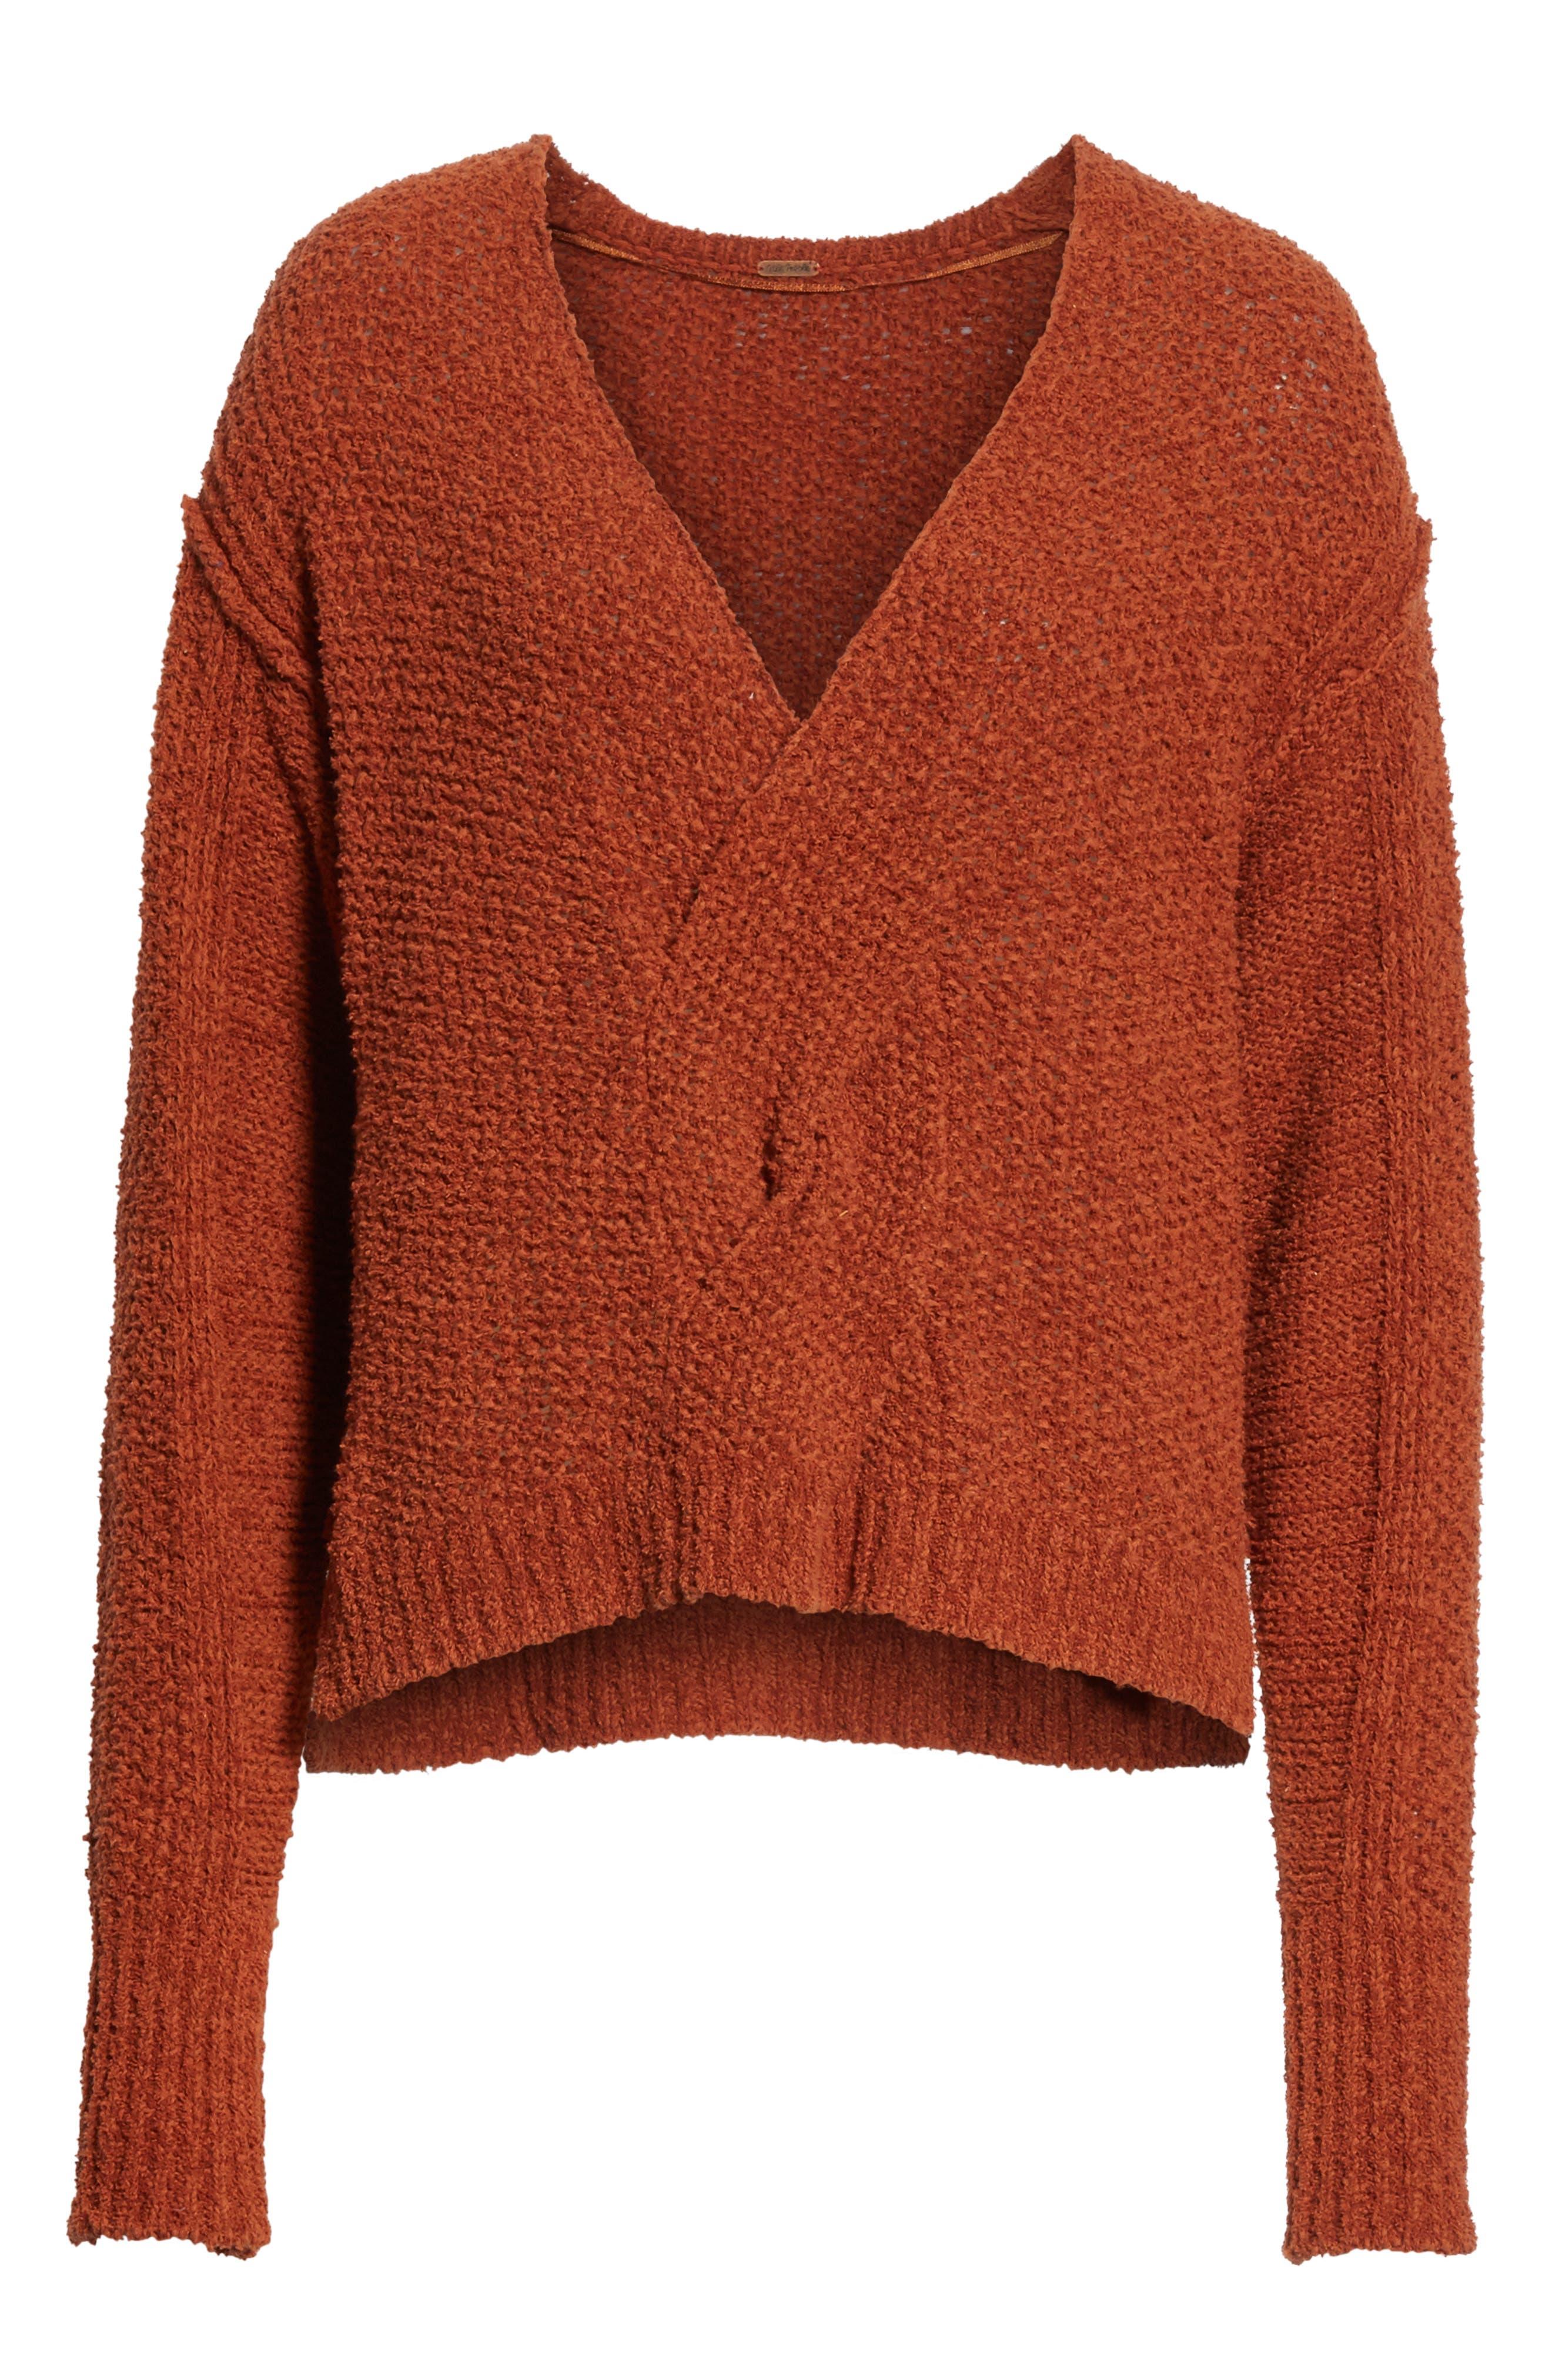 Coco V-Neck Sweater,                             Alternate thumbnail 6, color,                             Terracotta